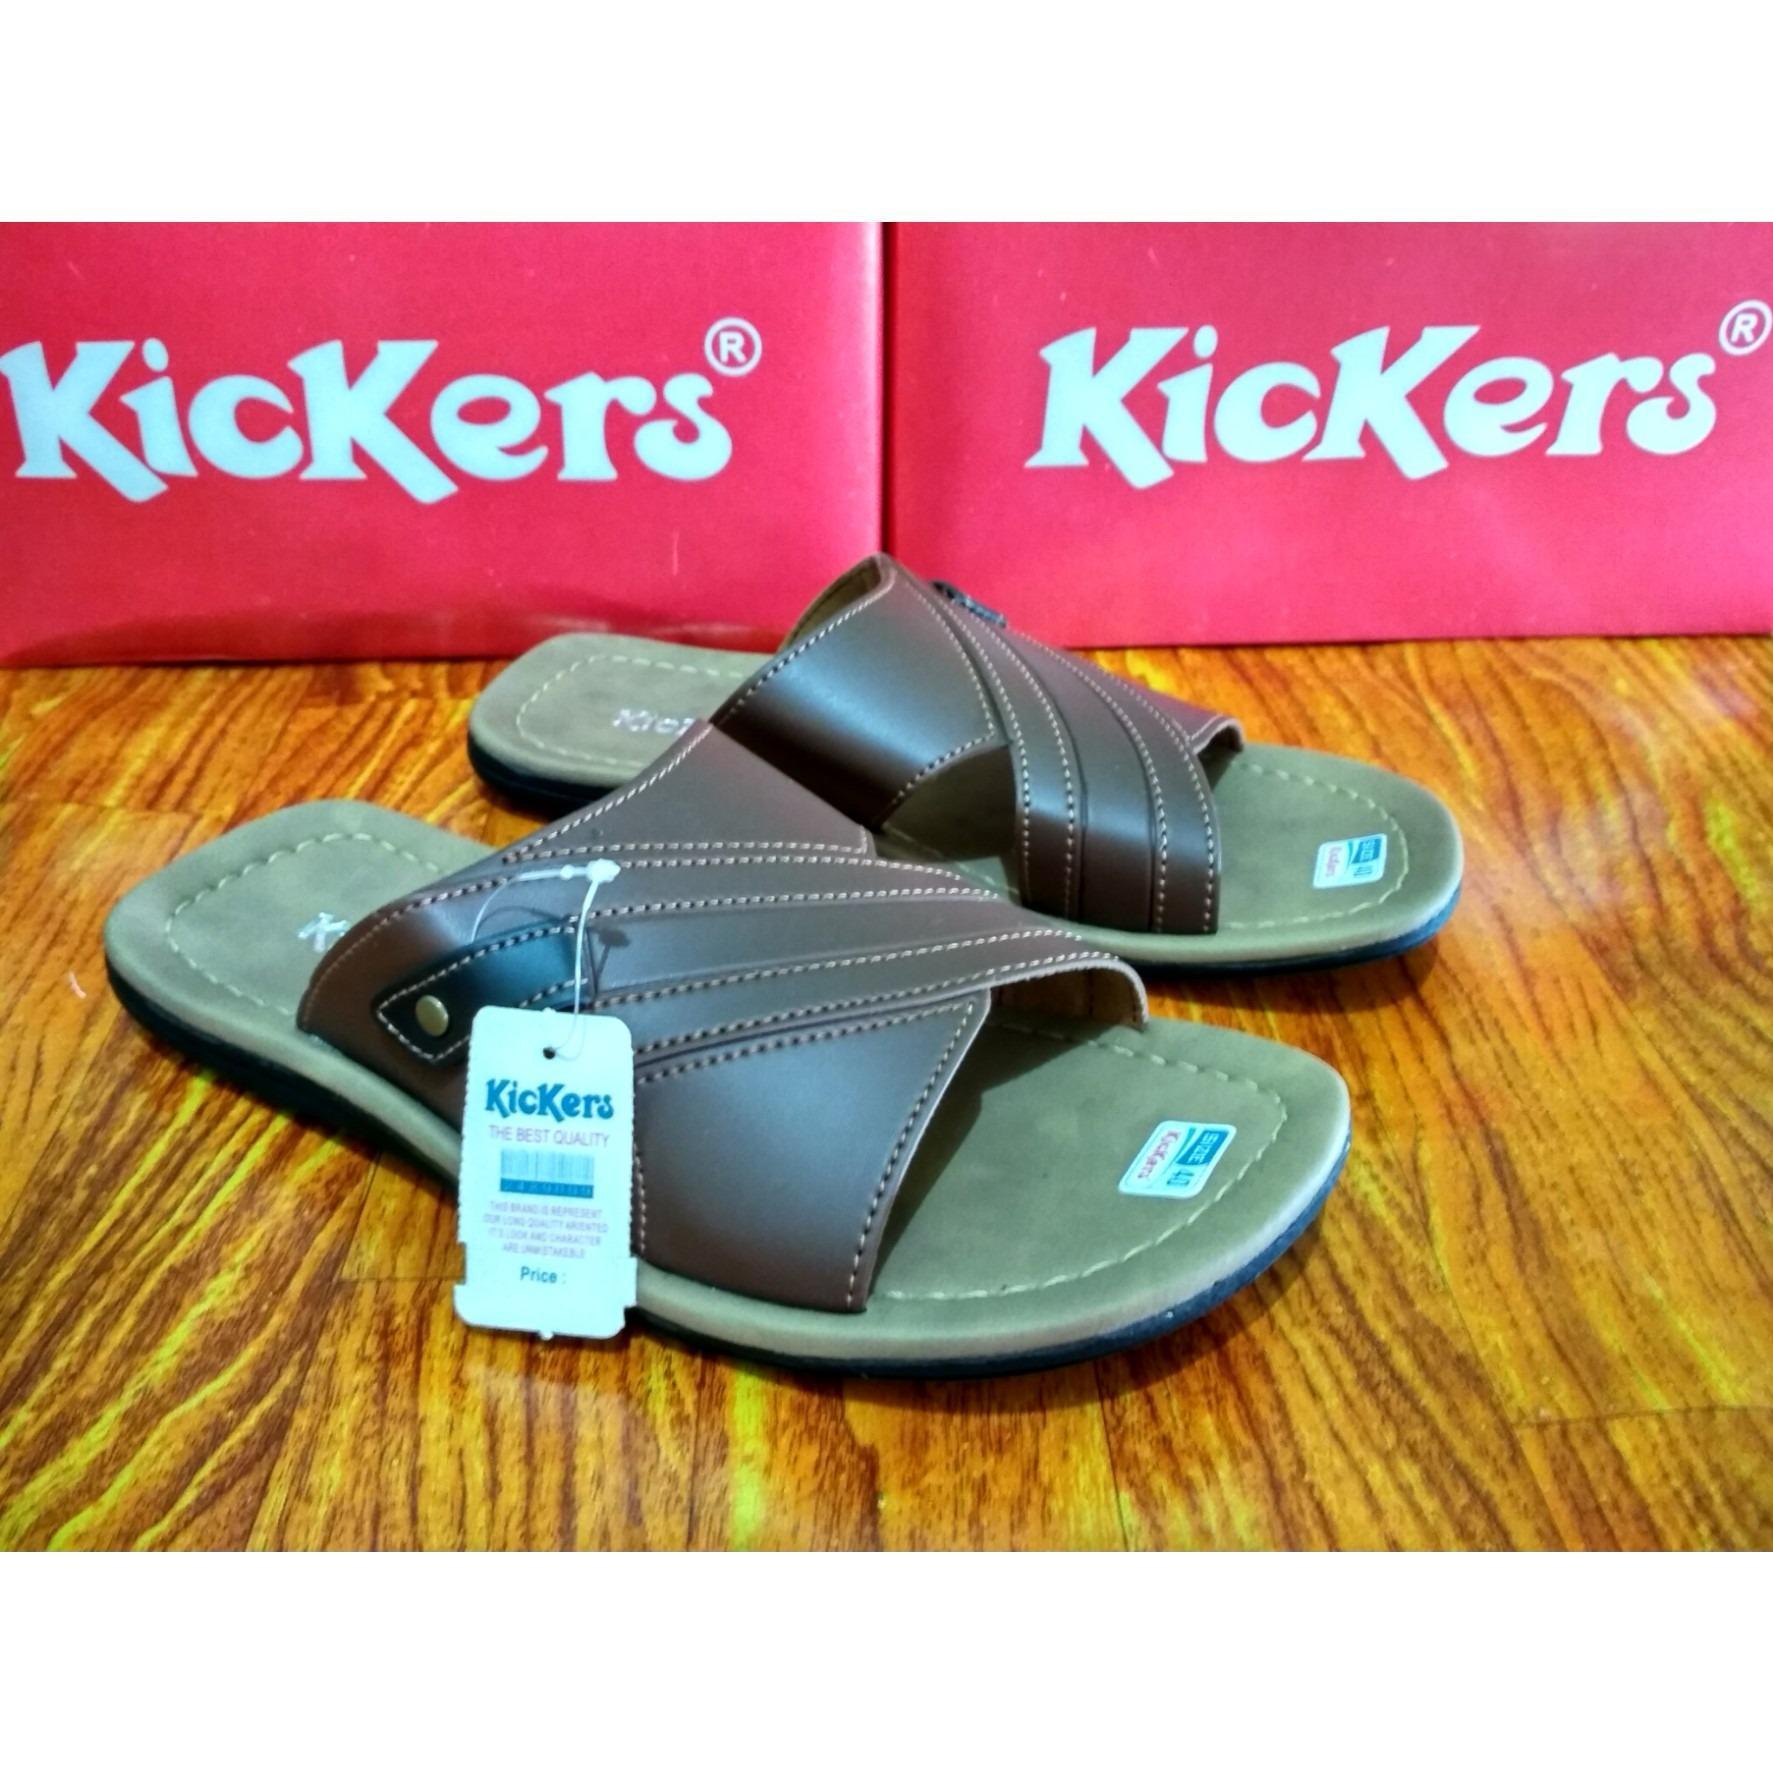 Kickers Sandal Kulit Pria - Sandal Kickers Pria - Sandal Pria Dewasa - Sandal Kulit - Sandal Pria - Fashion Pria Dewasa - Sandal Sendal Pria Slop Limited Edition